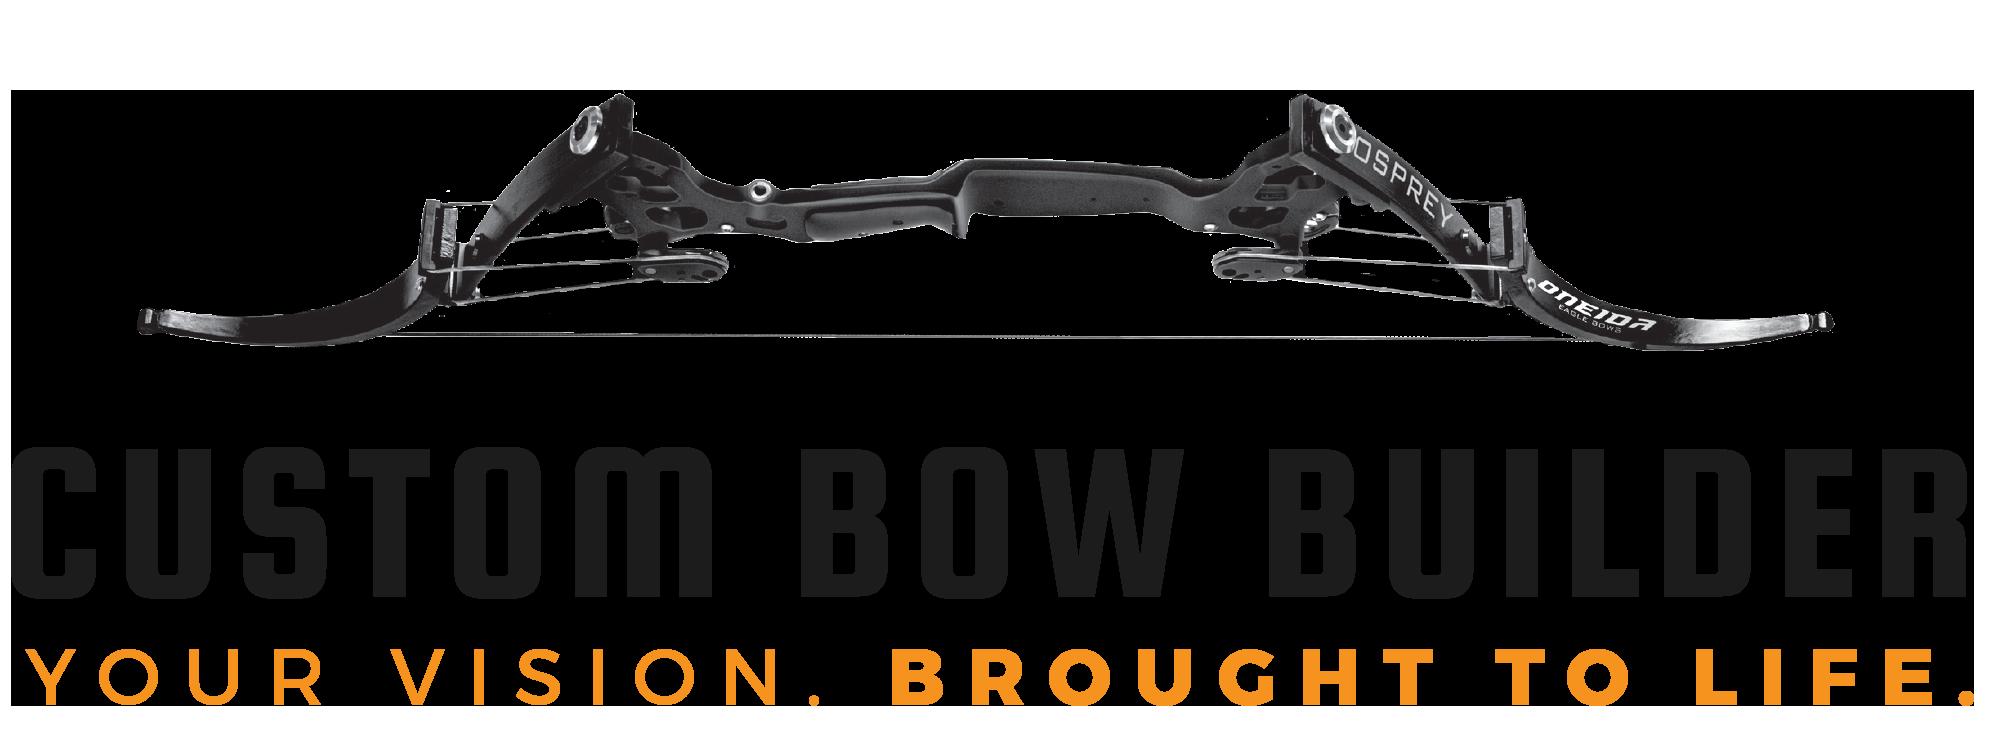 Oneida-Eagle-Bows-Custom-Bow-Widget.png